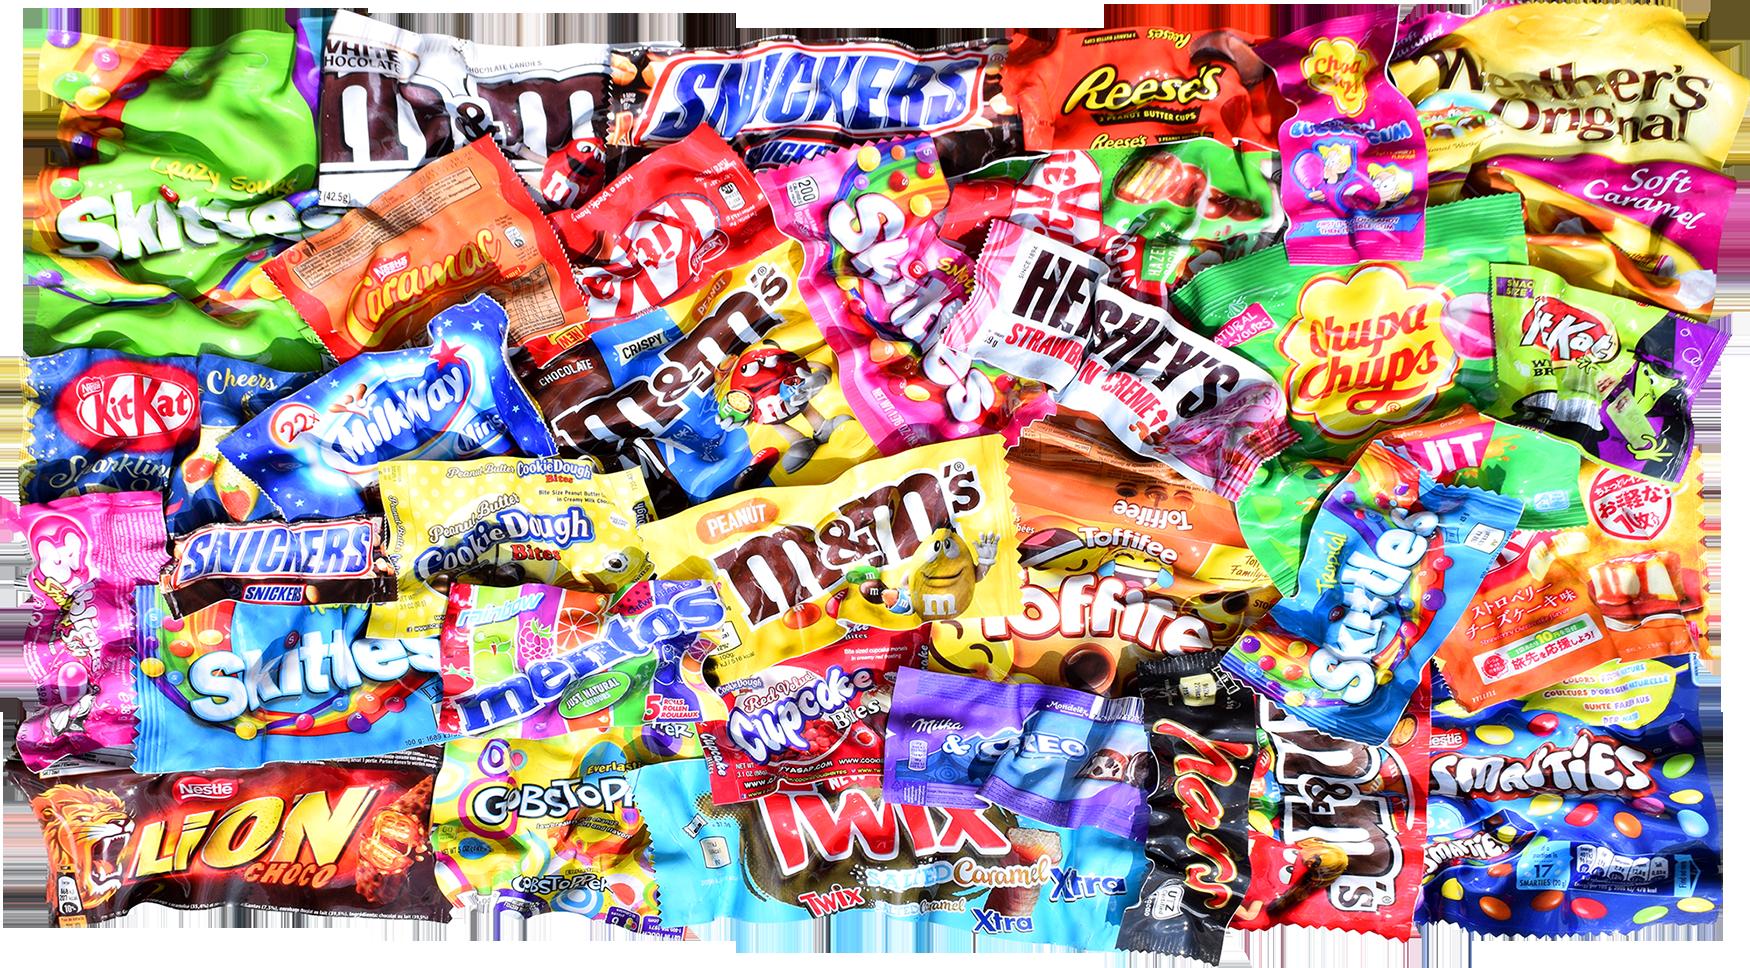 Floyd Douglas - Art Candy XL III (Toffifee-M&M's) , 0656-012-104